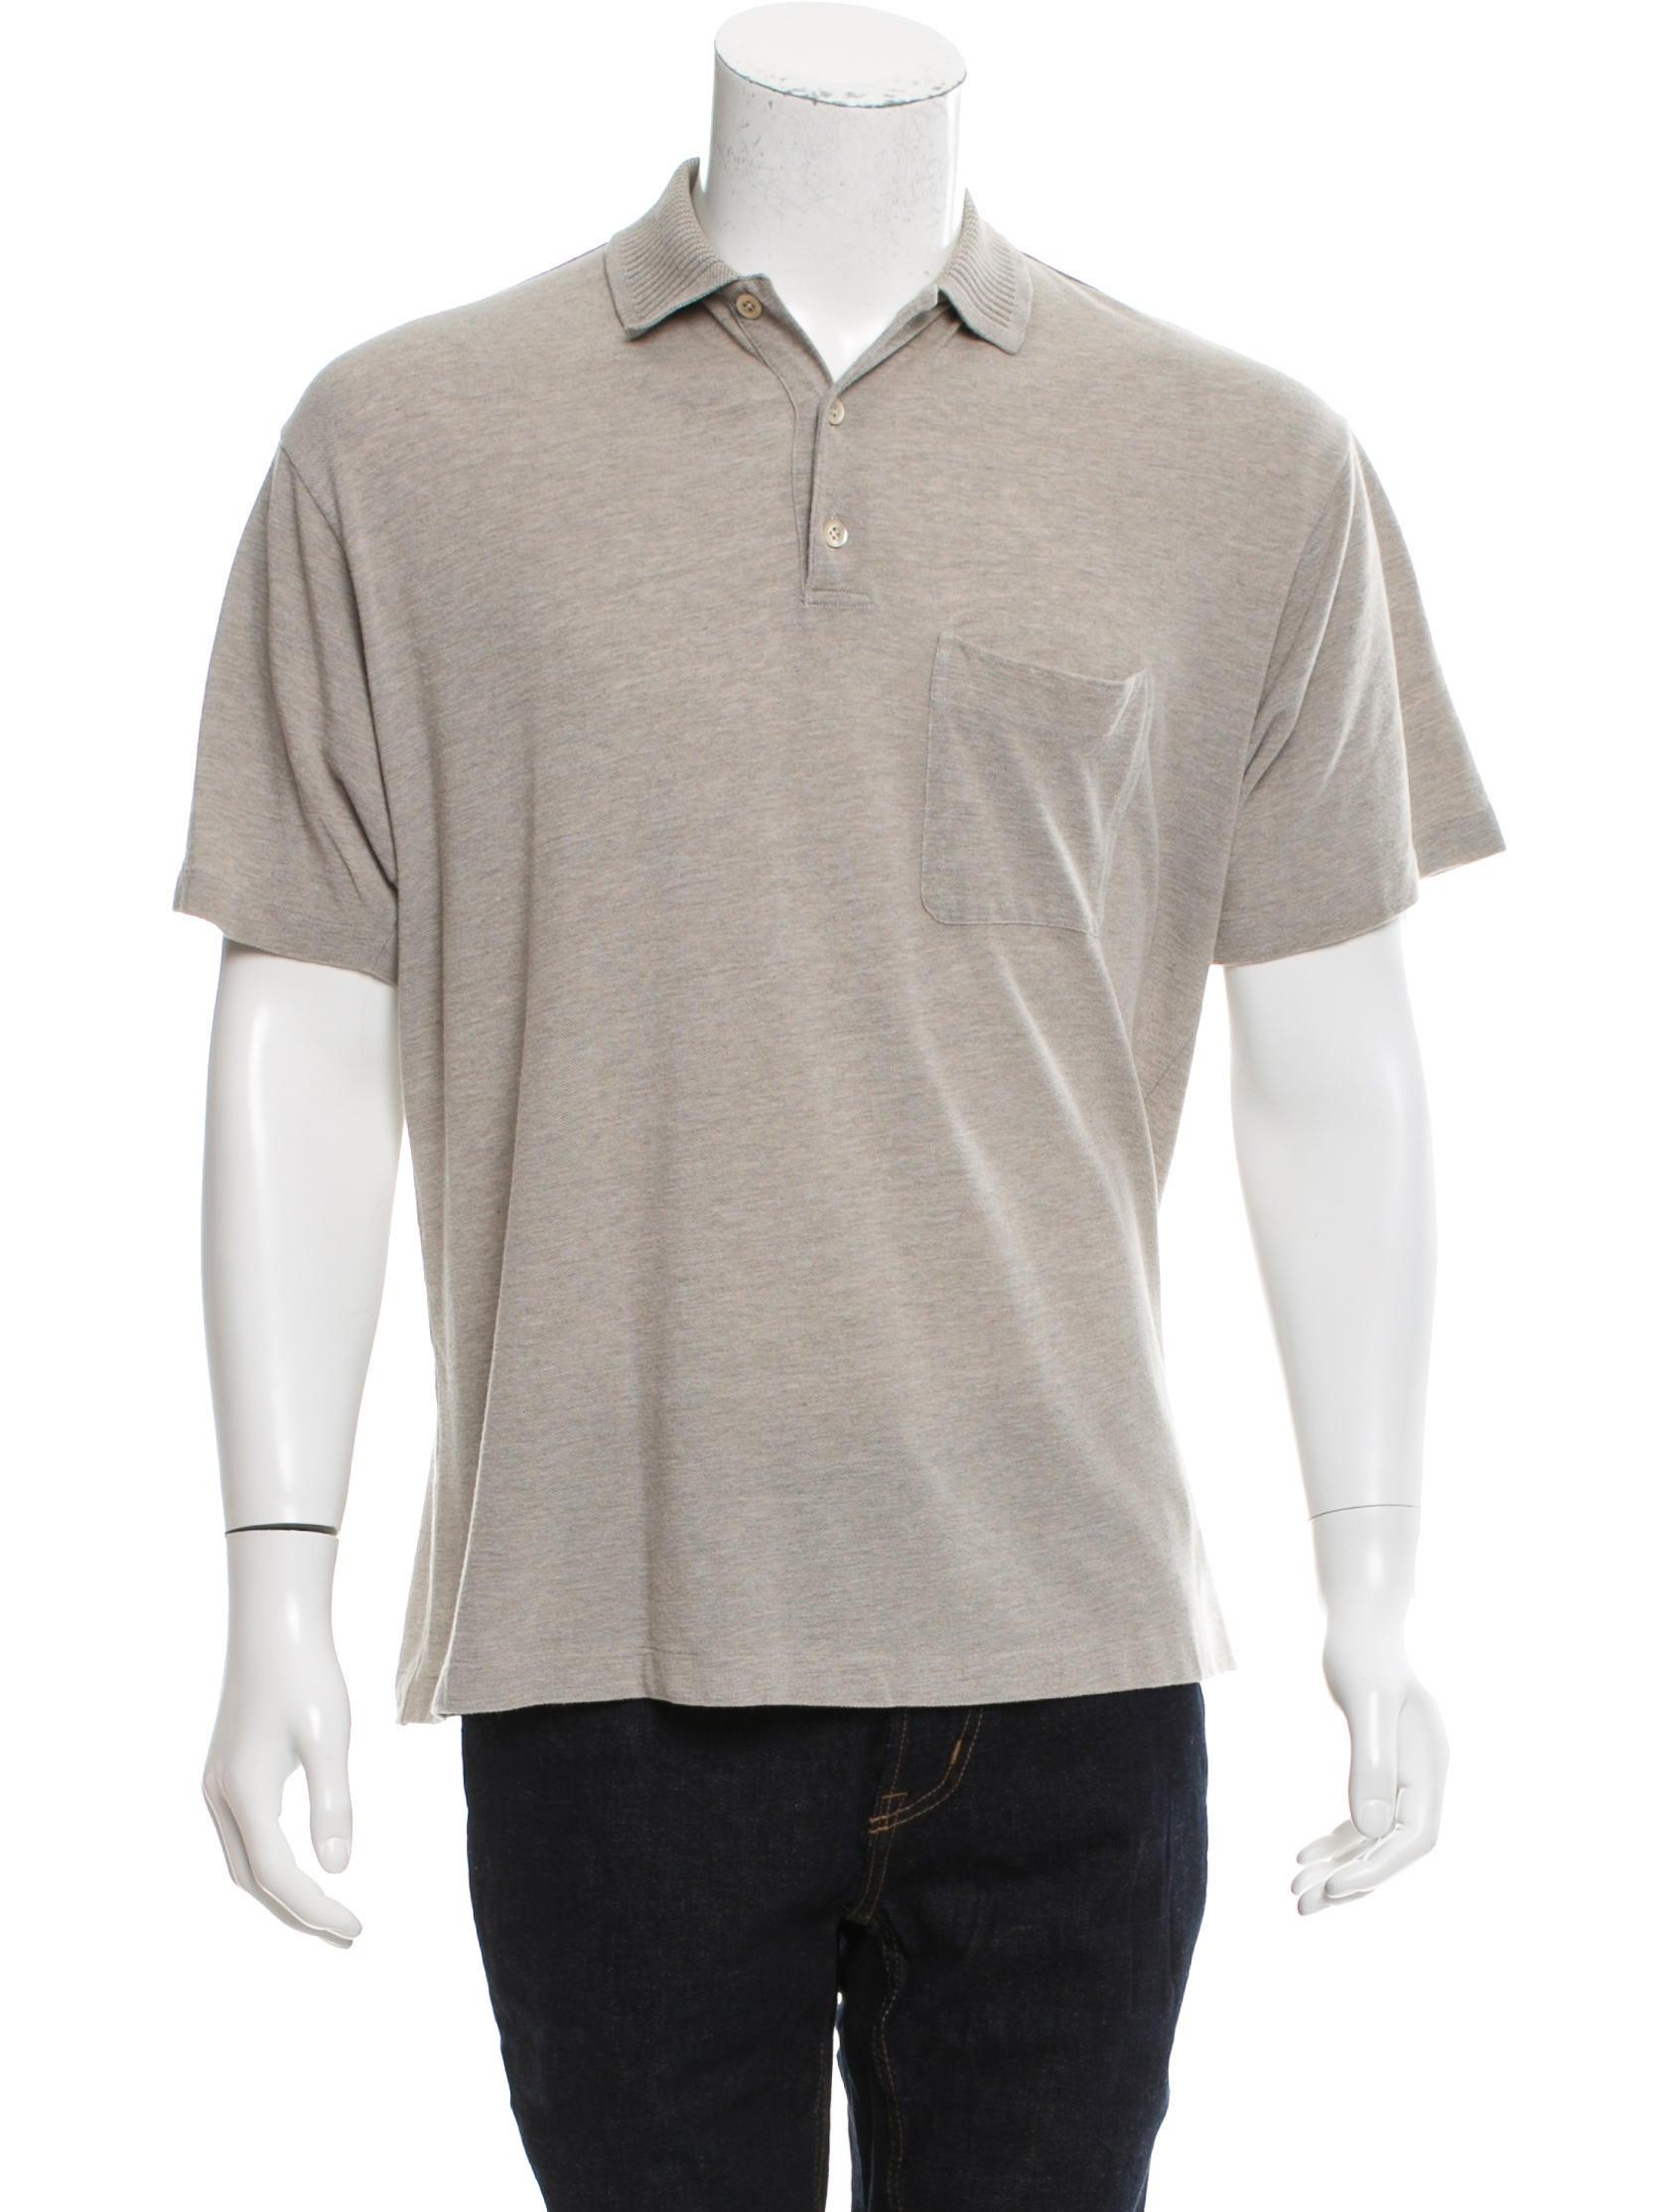 Ermenegildo zegna knit polo shirt clothing zgn24739 for Zegna polo shirts sale